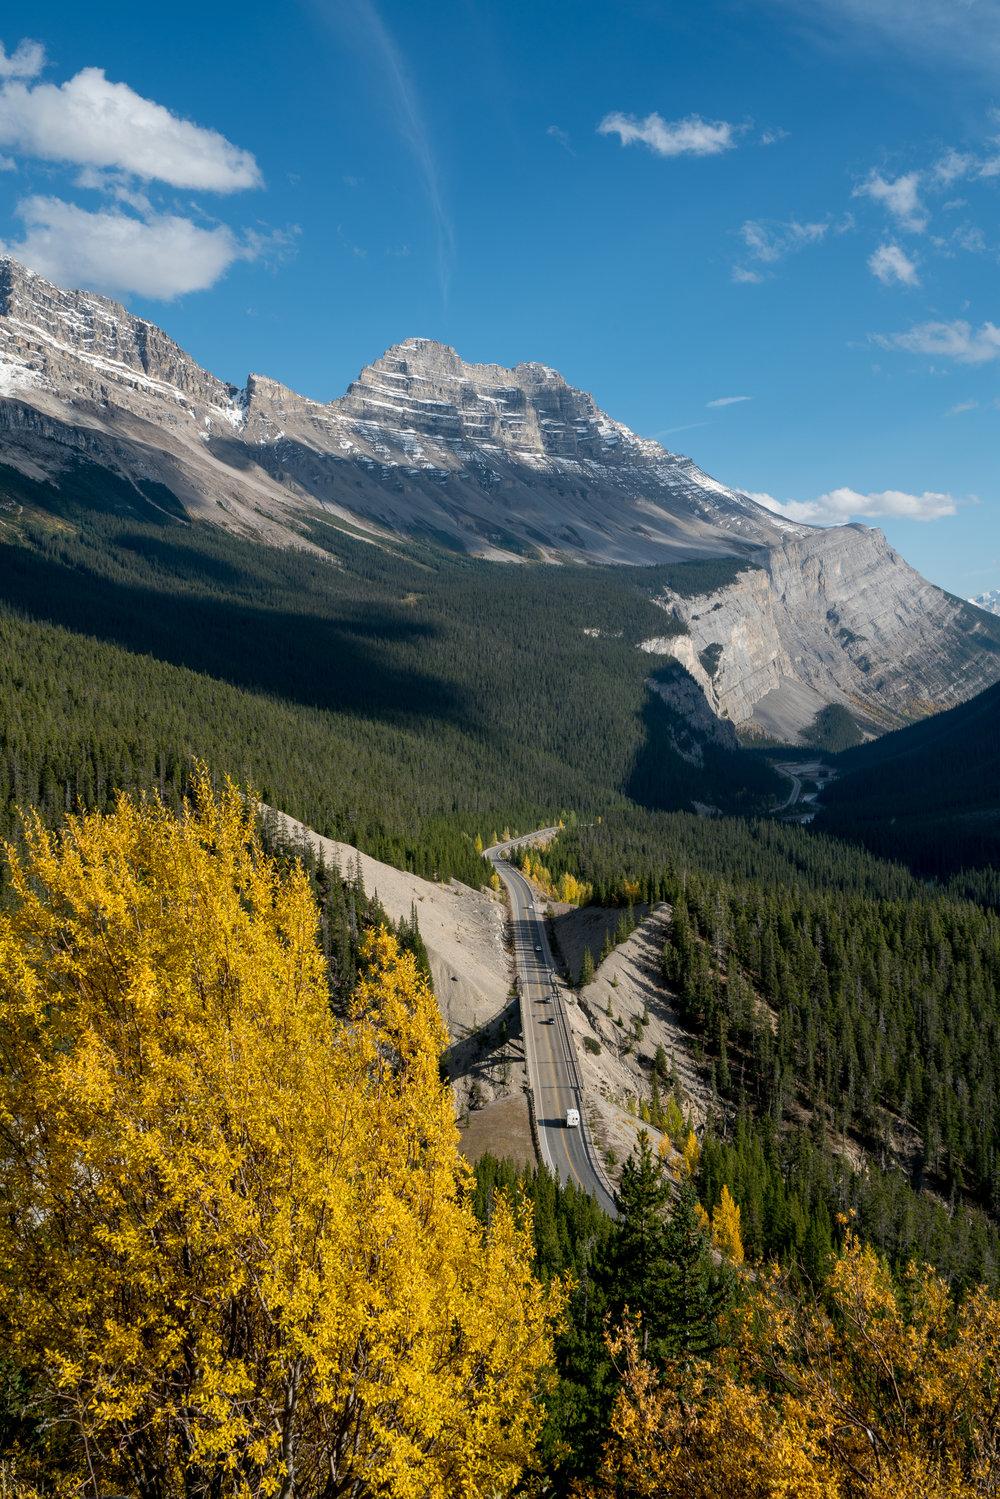 Canadian Rockies, Canada